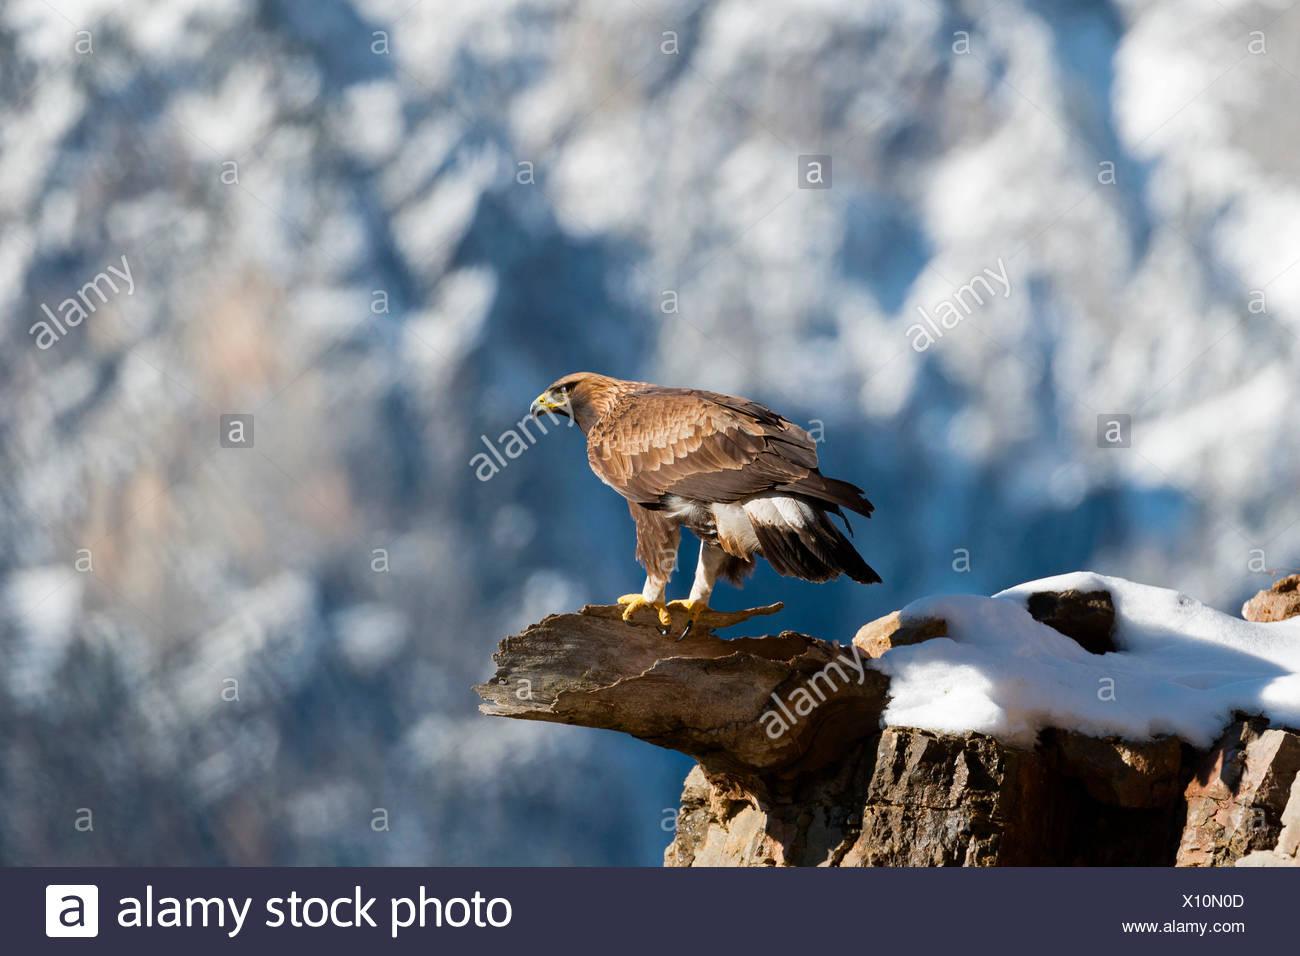 Europe, Italy, Trentino, Dolomites, Fassa Valley, golden eagle - Stock Image